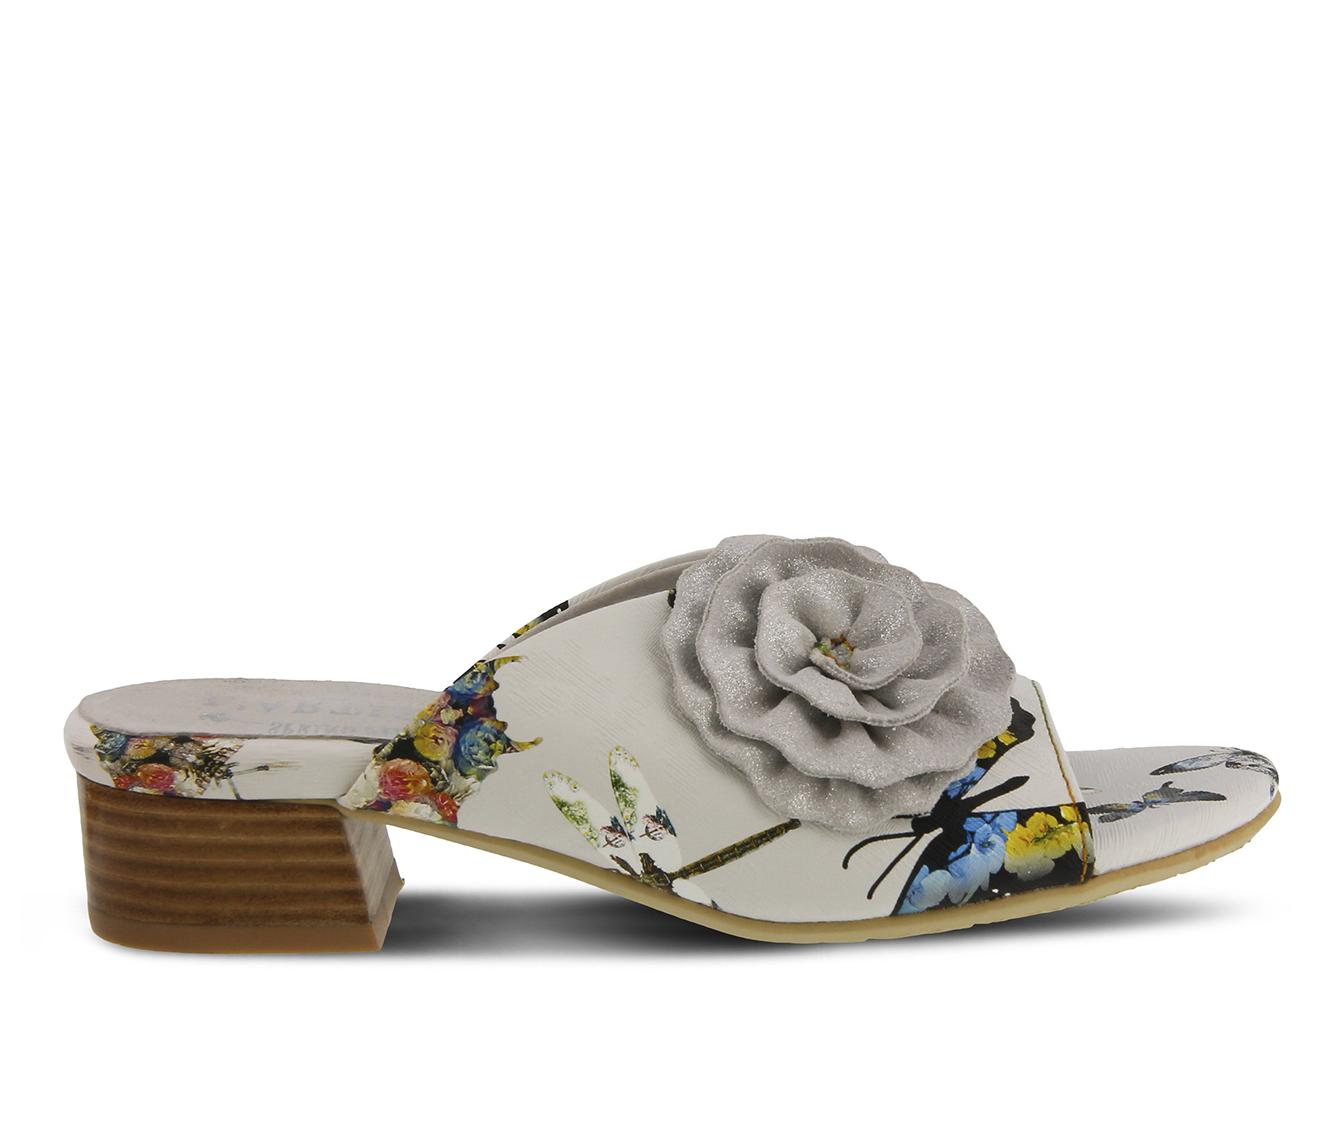 L'Artiste Isittora Women's Sandal (White Leather)